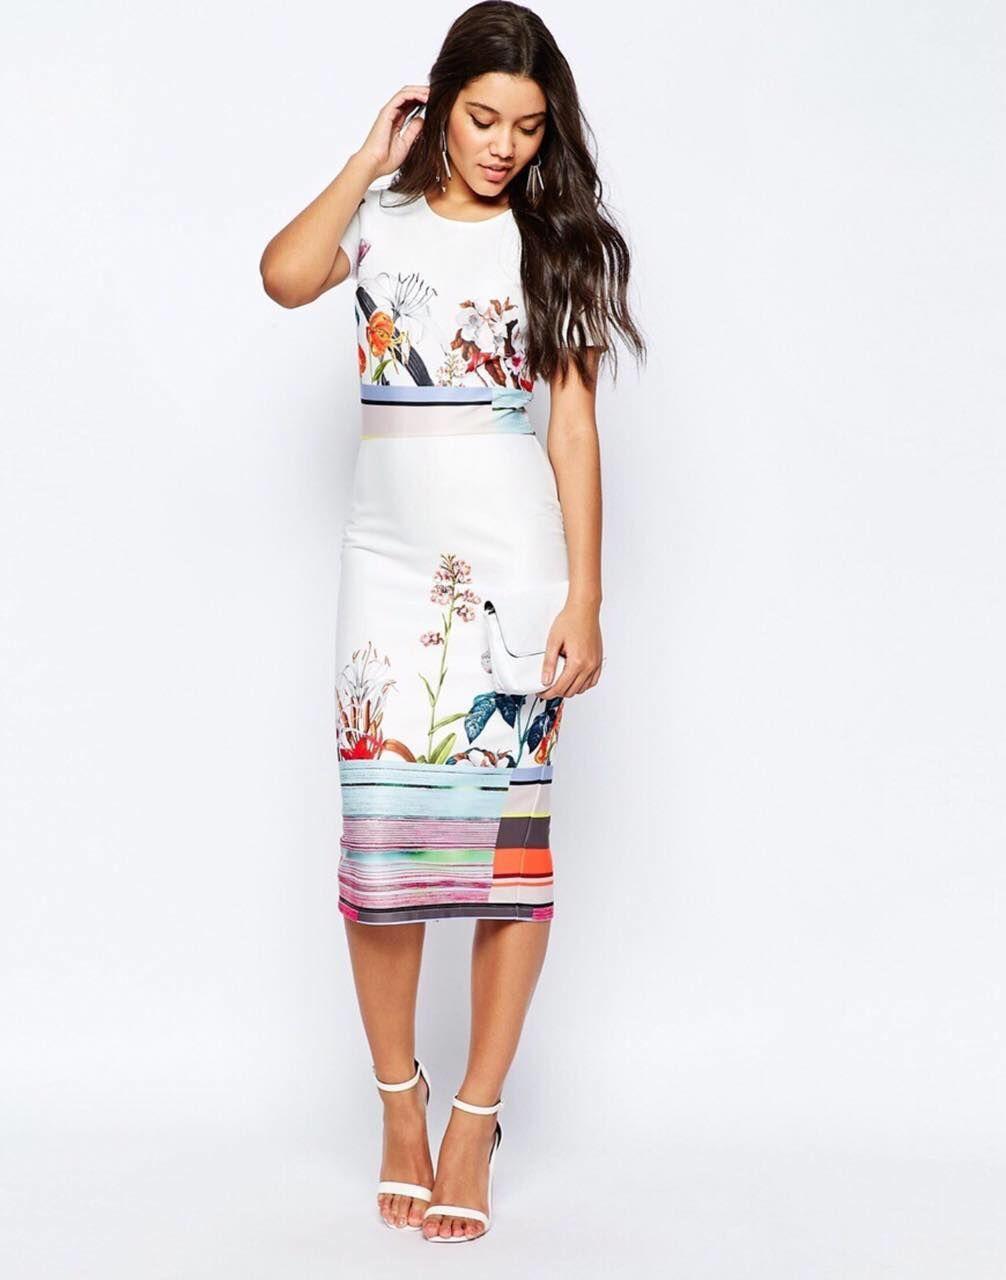 60c67b0d79 Fashion Dresses for sale - Dress for Women online brands